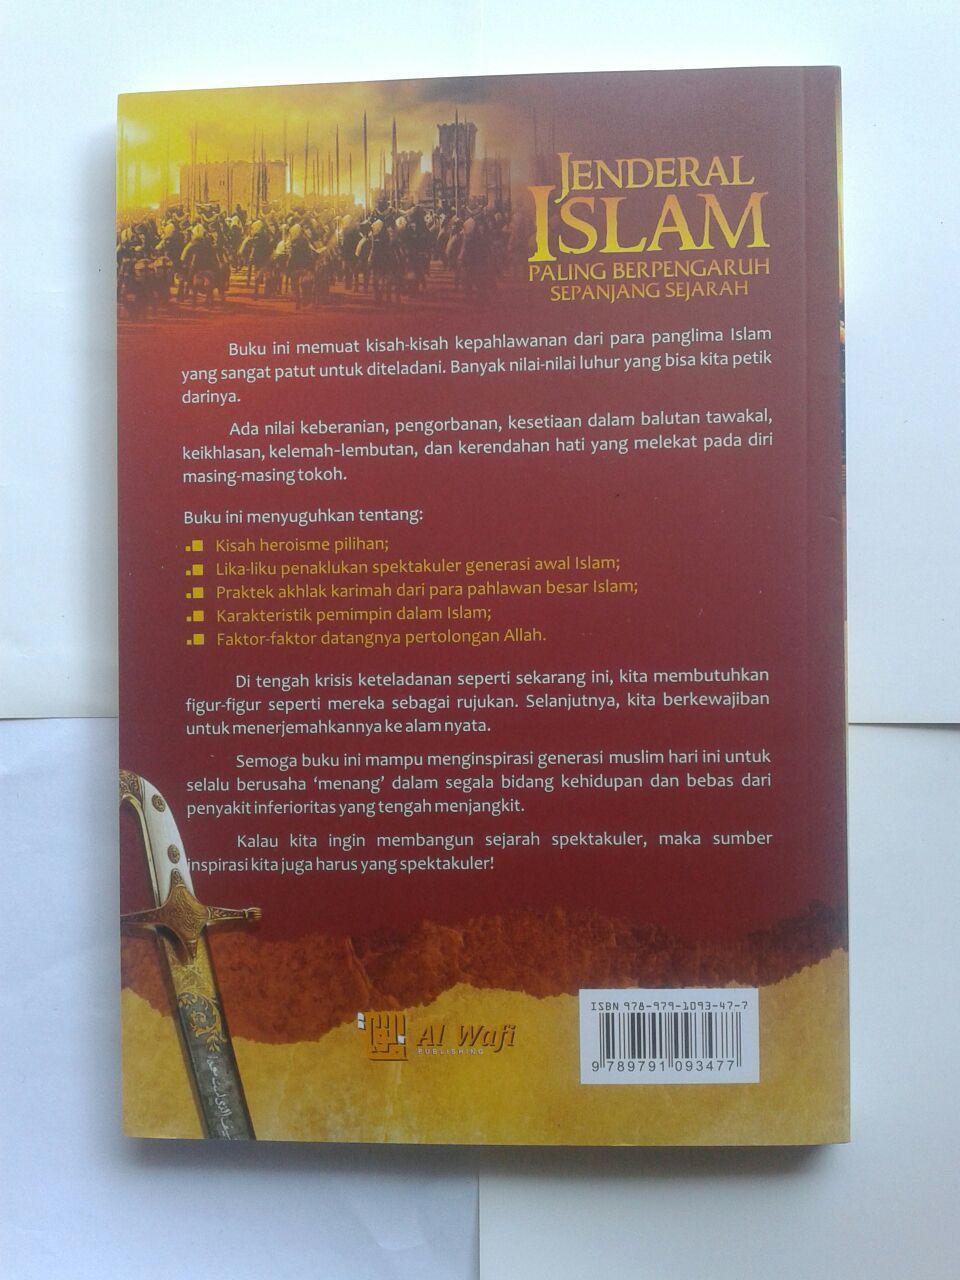 Buku Jenderal Islam Paling Berpengaruh Sepanjang Sejarah cover 2